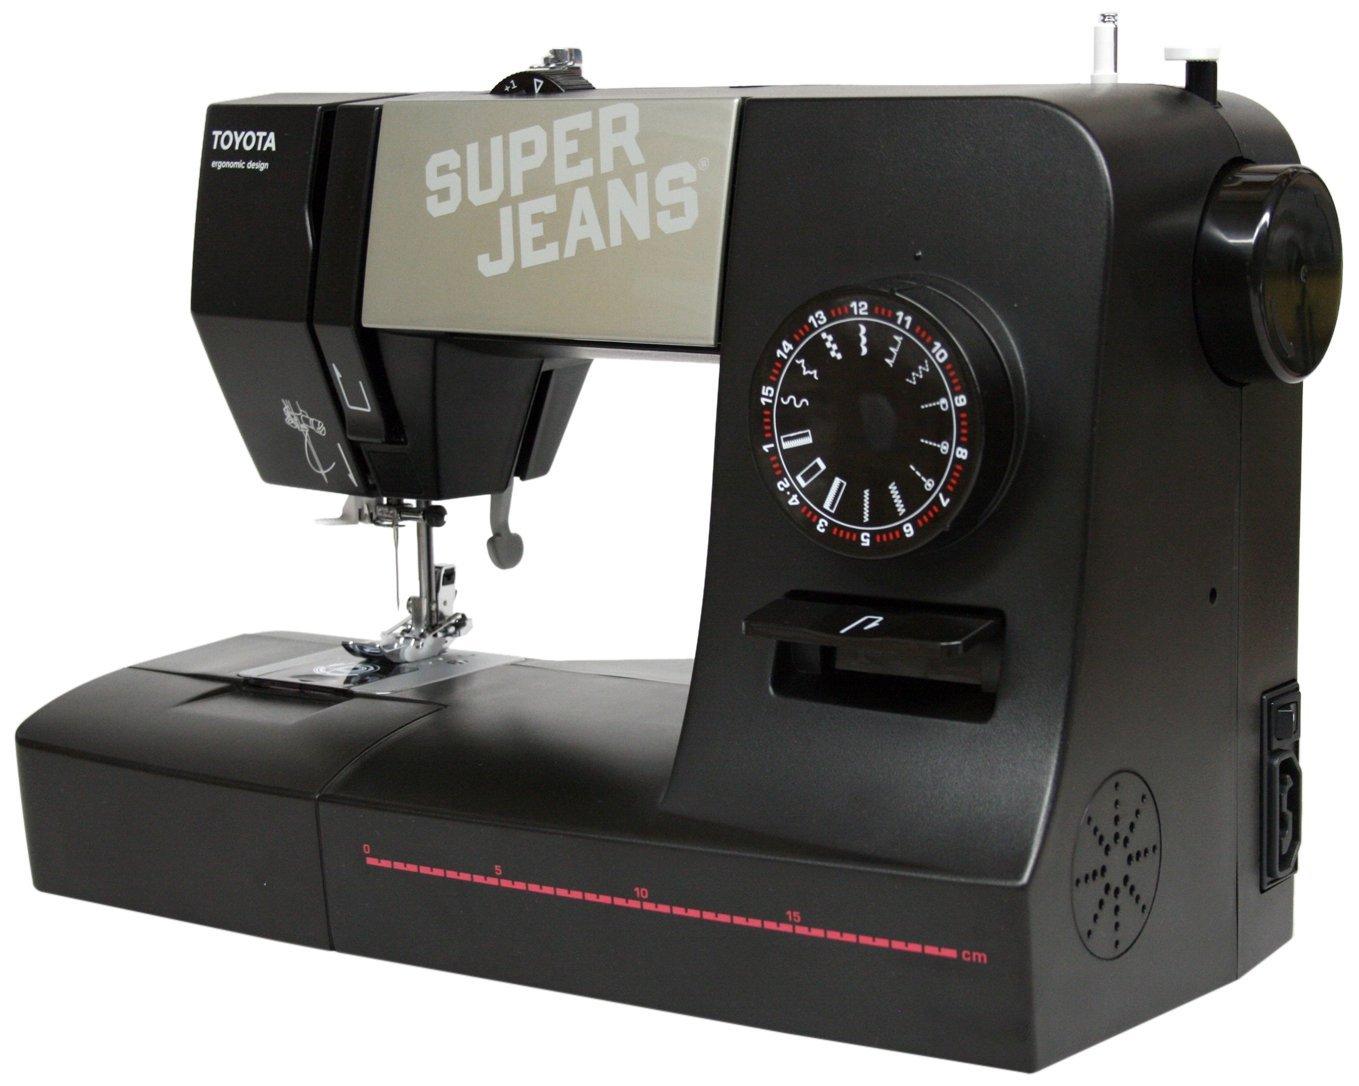 Toyota 15B Super Jeans Sewing Machine, Black SUPERJ15